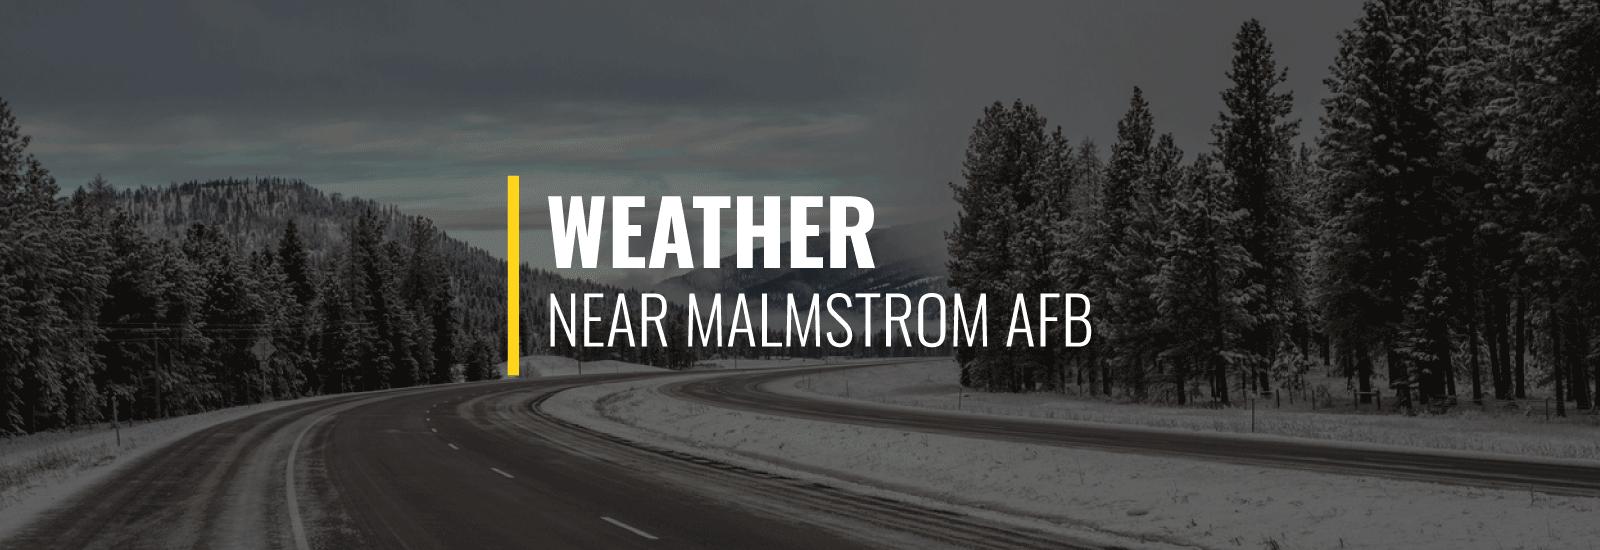 Malmstrom AFB Weather